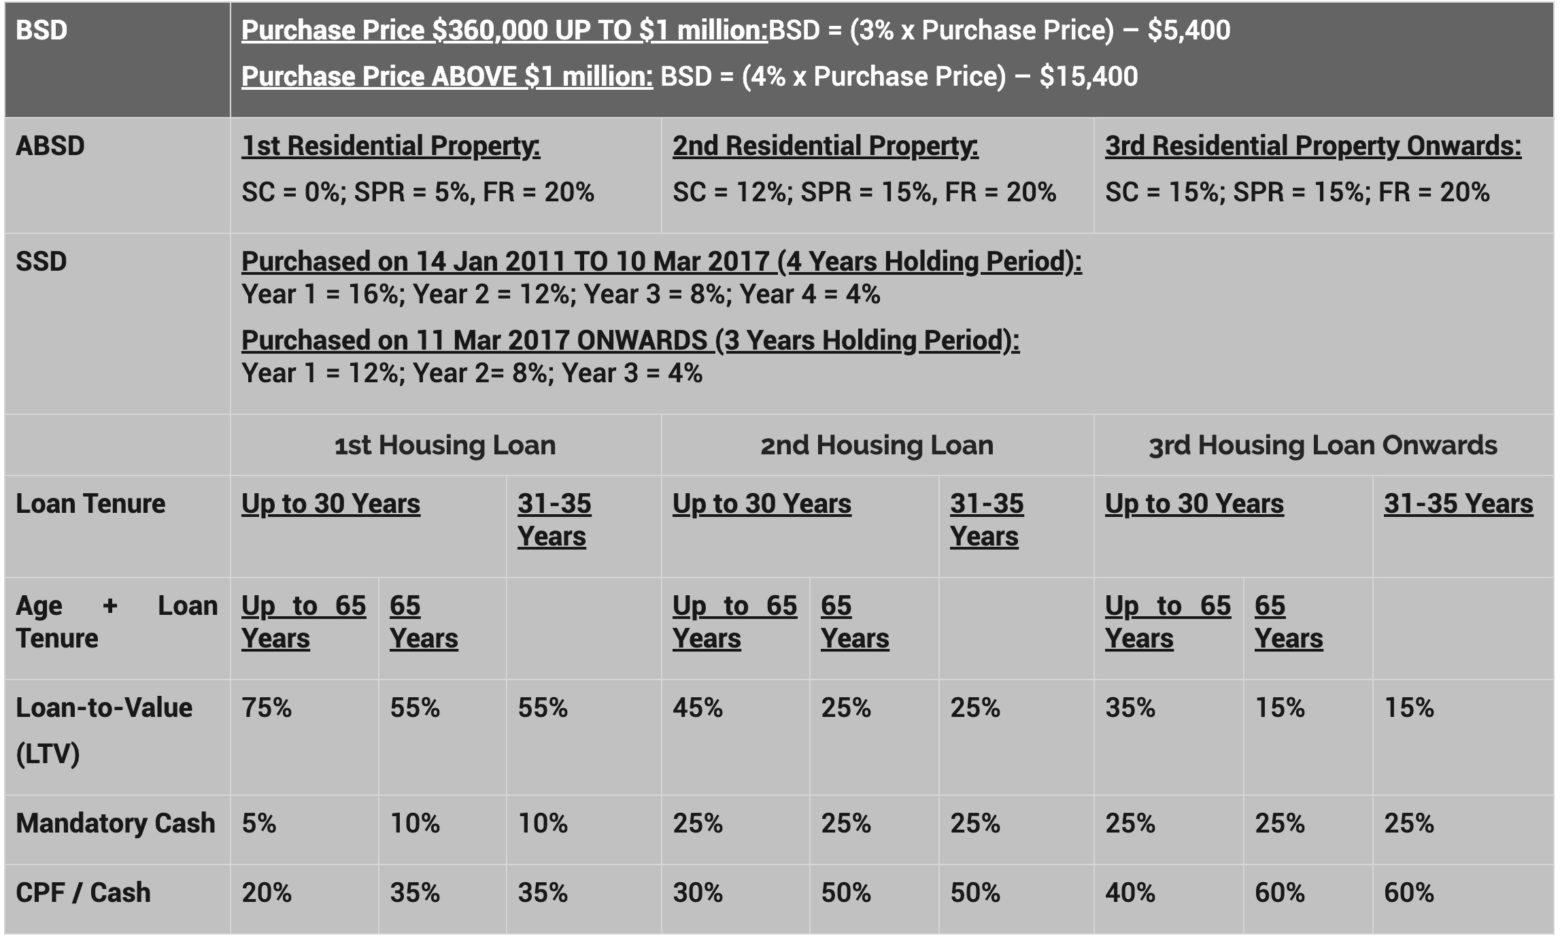 Singapore ABSD Rates | SG Luxury Condo